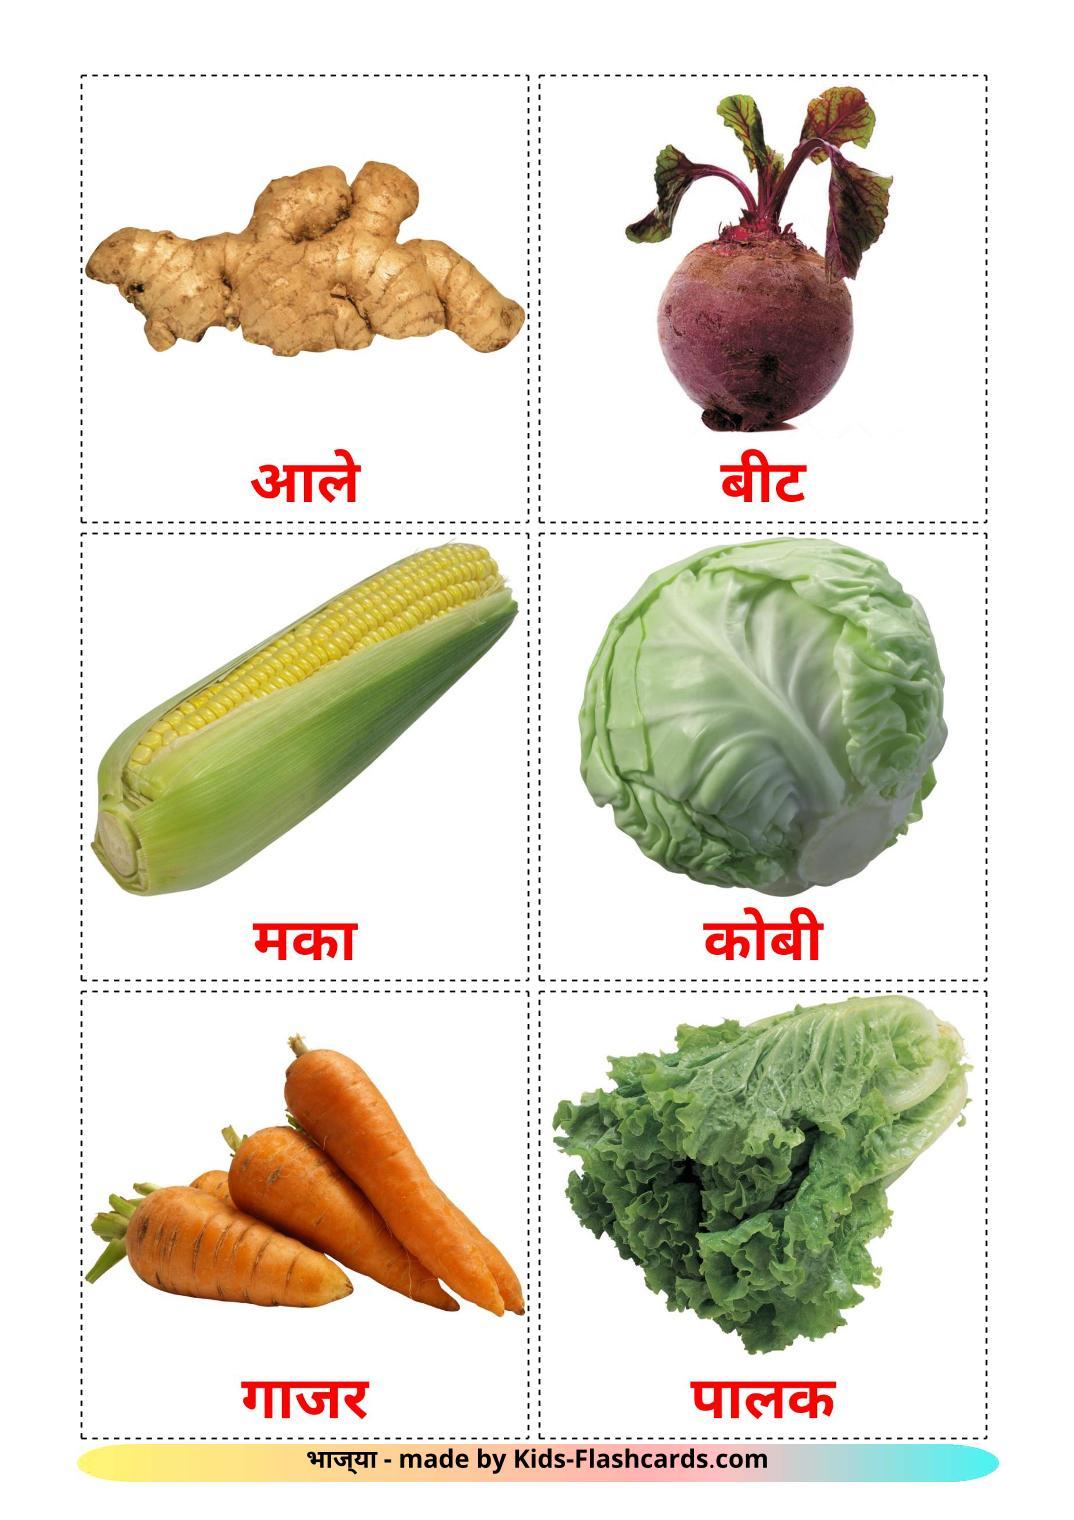 Vegetables - 29 Free Printable marathi Flashcards